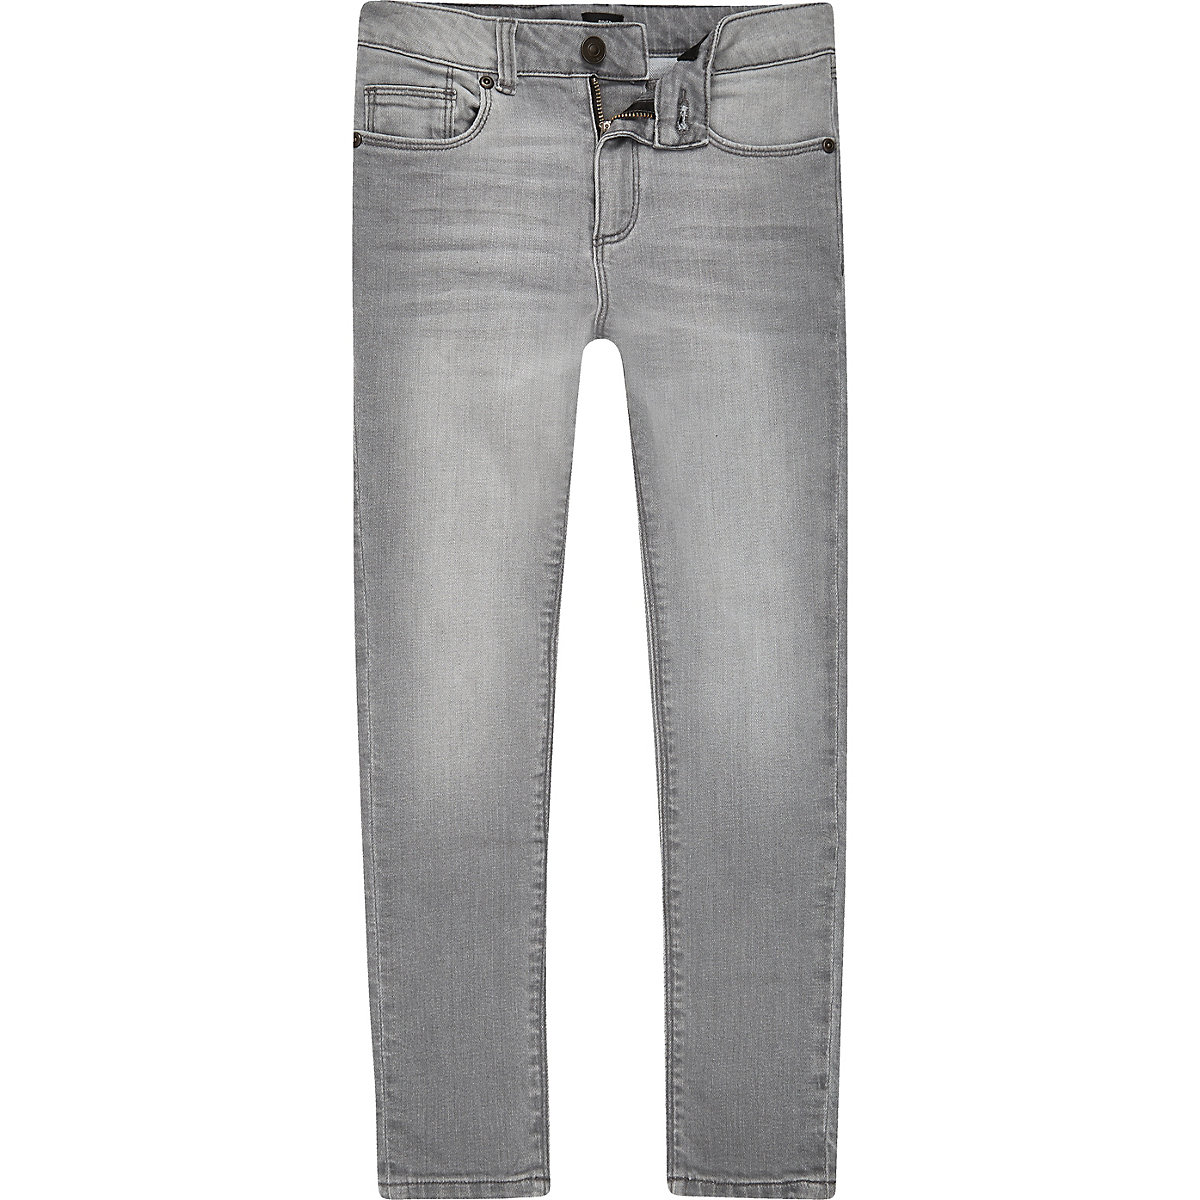 Boys grey Danny super skinny jeans